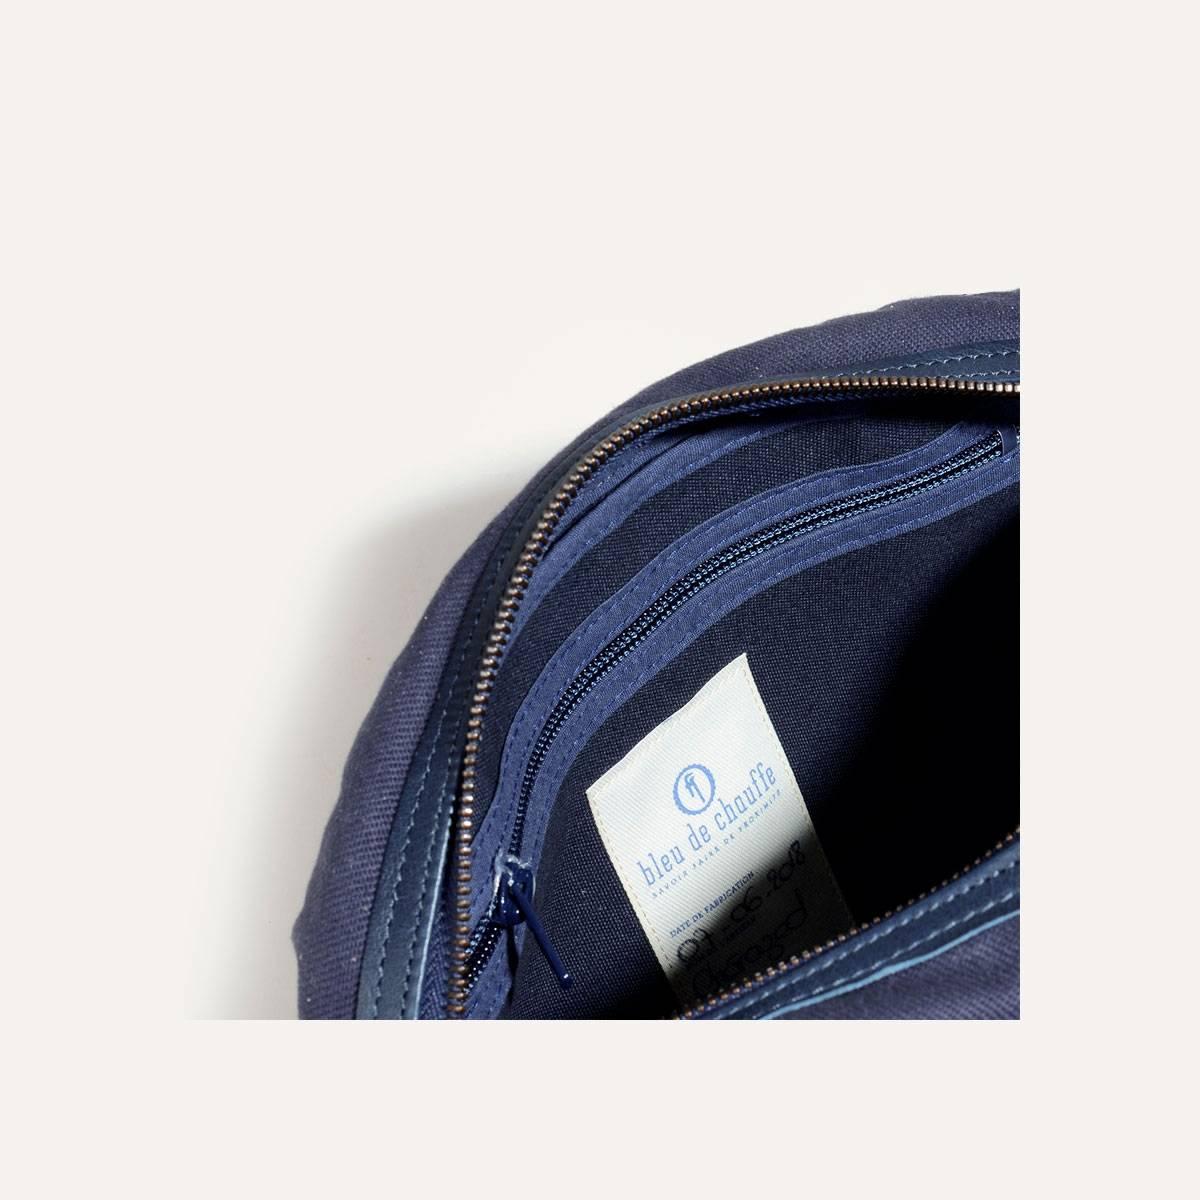 Honshu Belt bag - Navy / Black (image n°8)